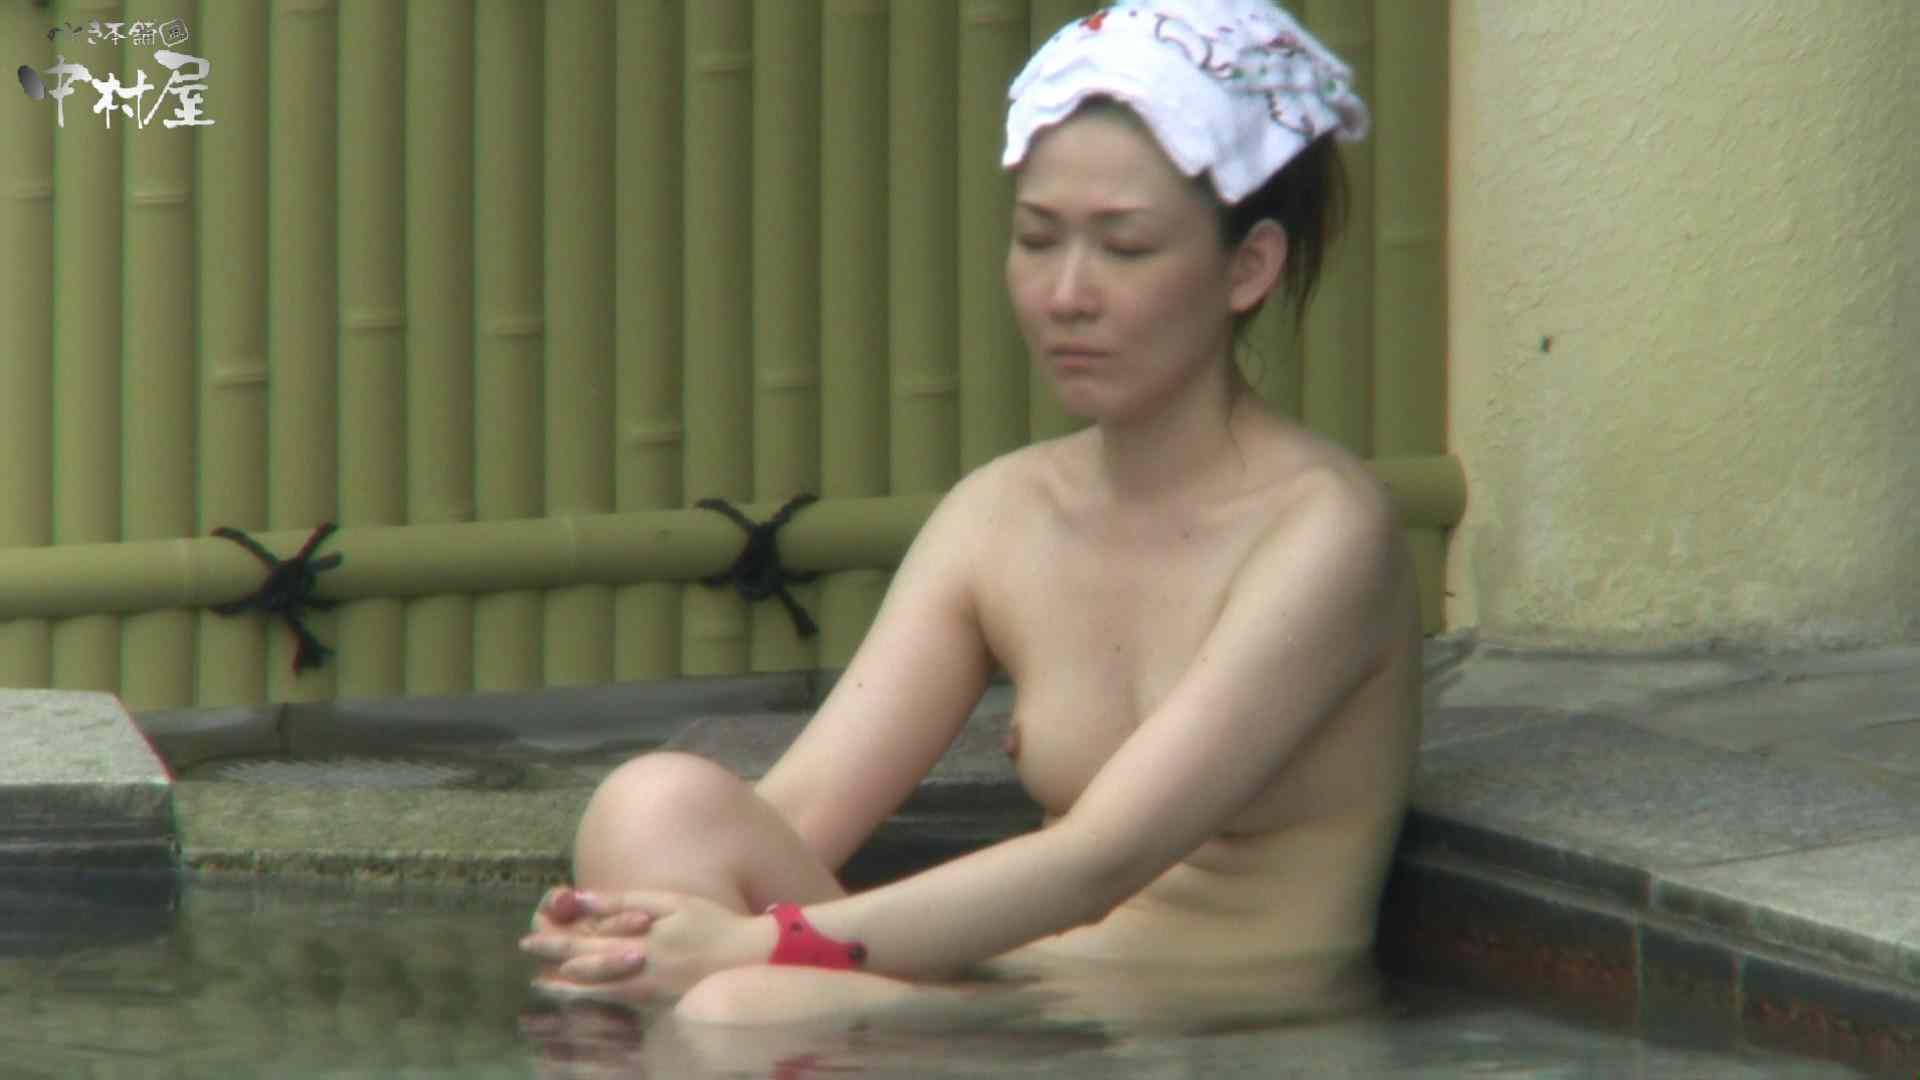 Aquaな露天風呂Vol.943 盗撮 セックス無修正動画無料 108画像 98